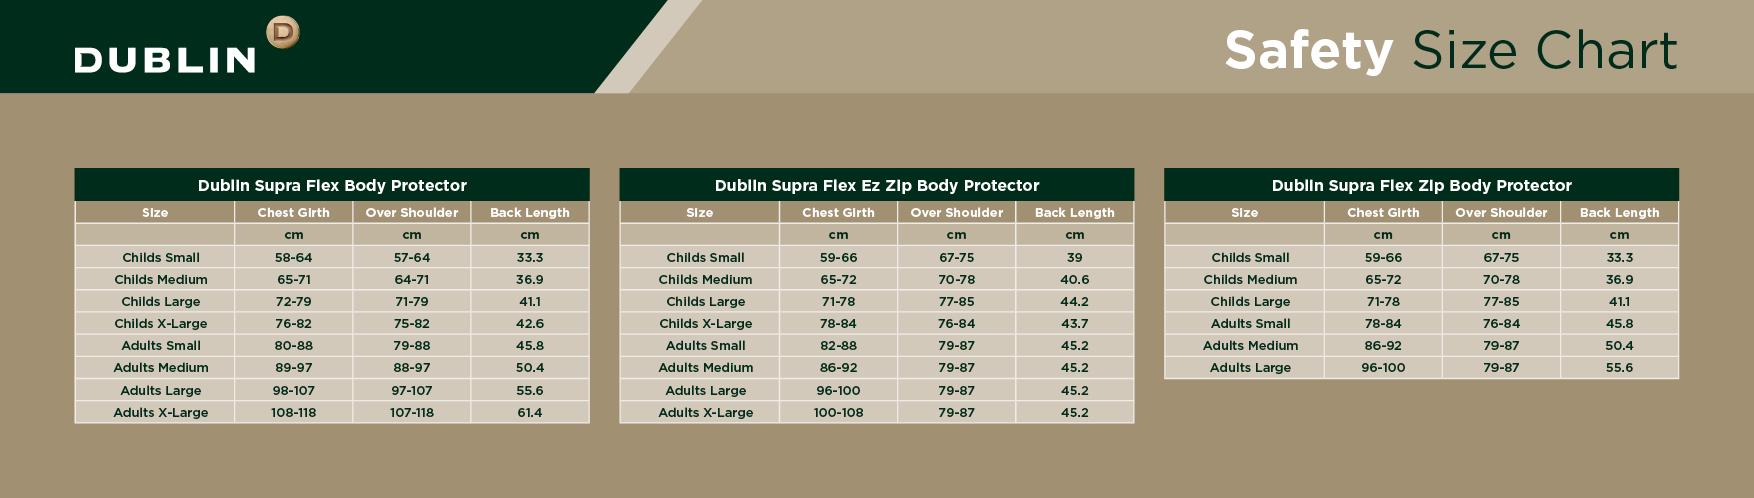 Dublin Safety Size Chart